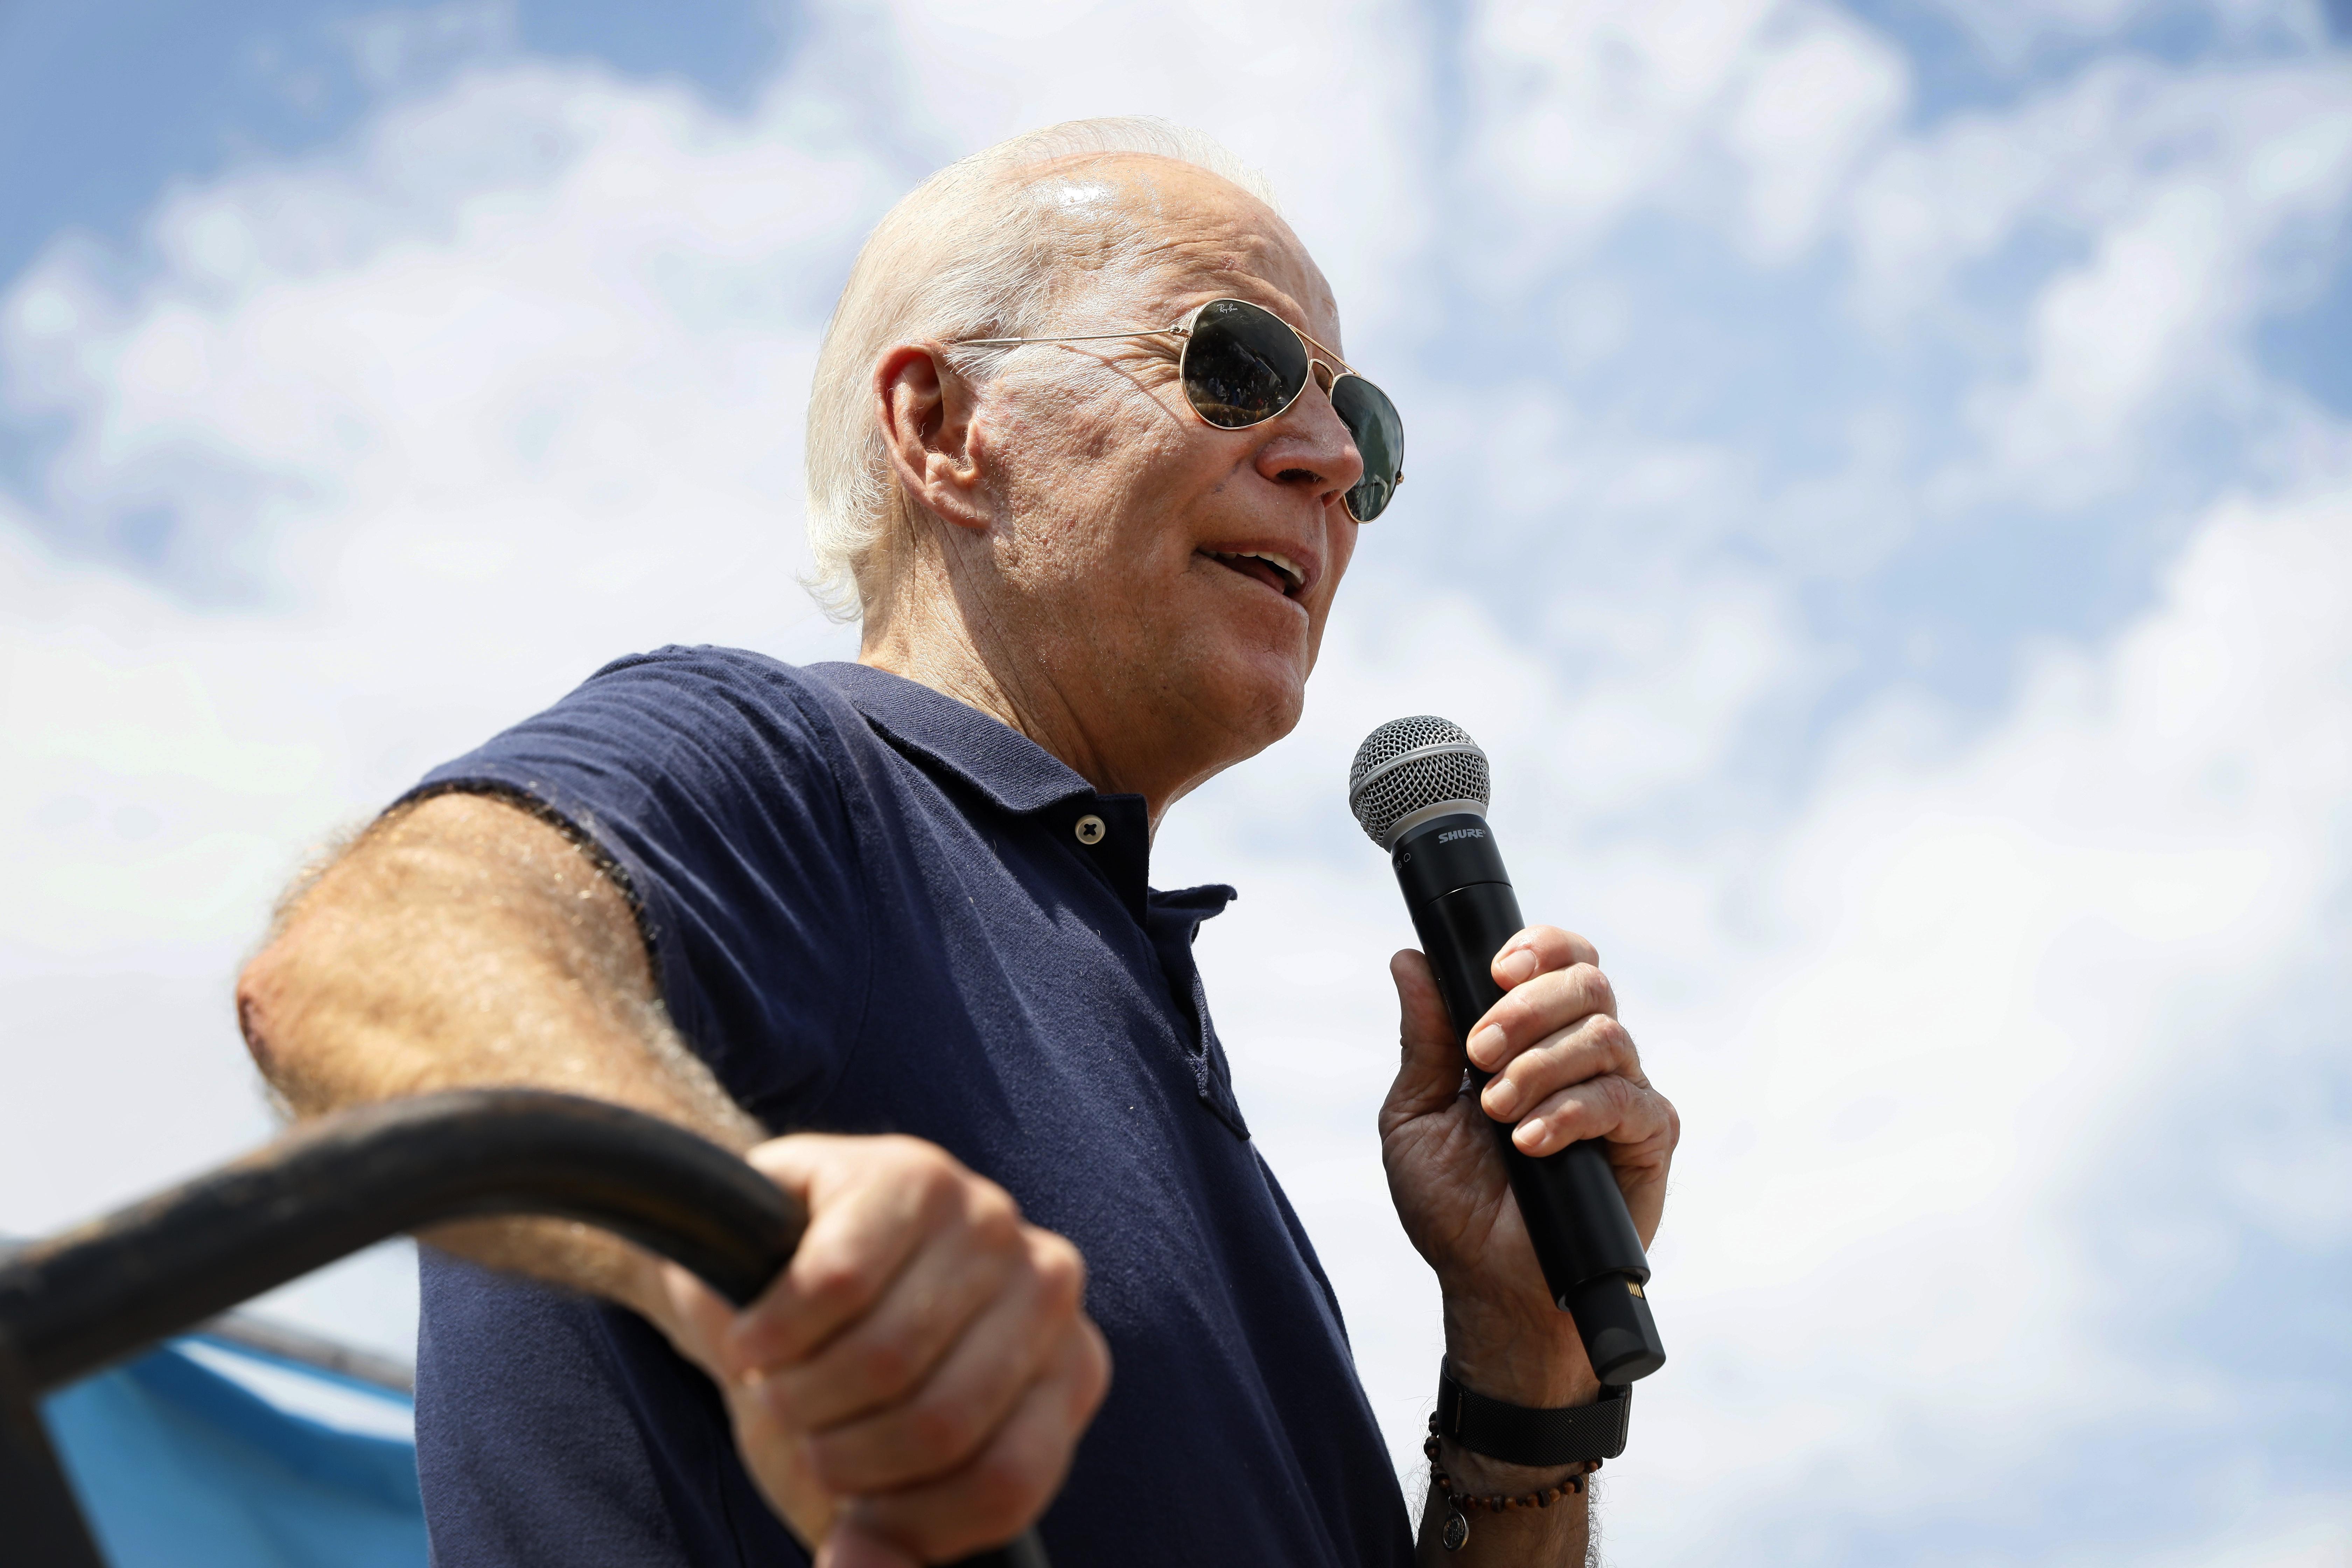 US presidential candidate Joe Biden speaking to a crowd.